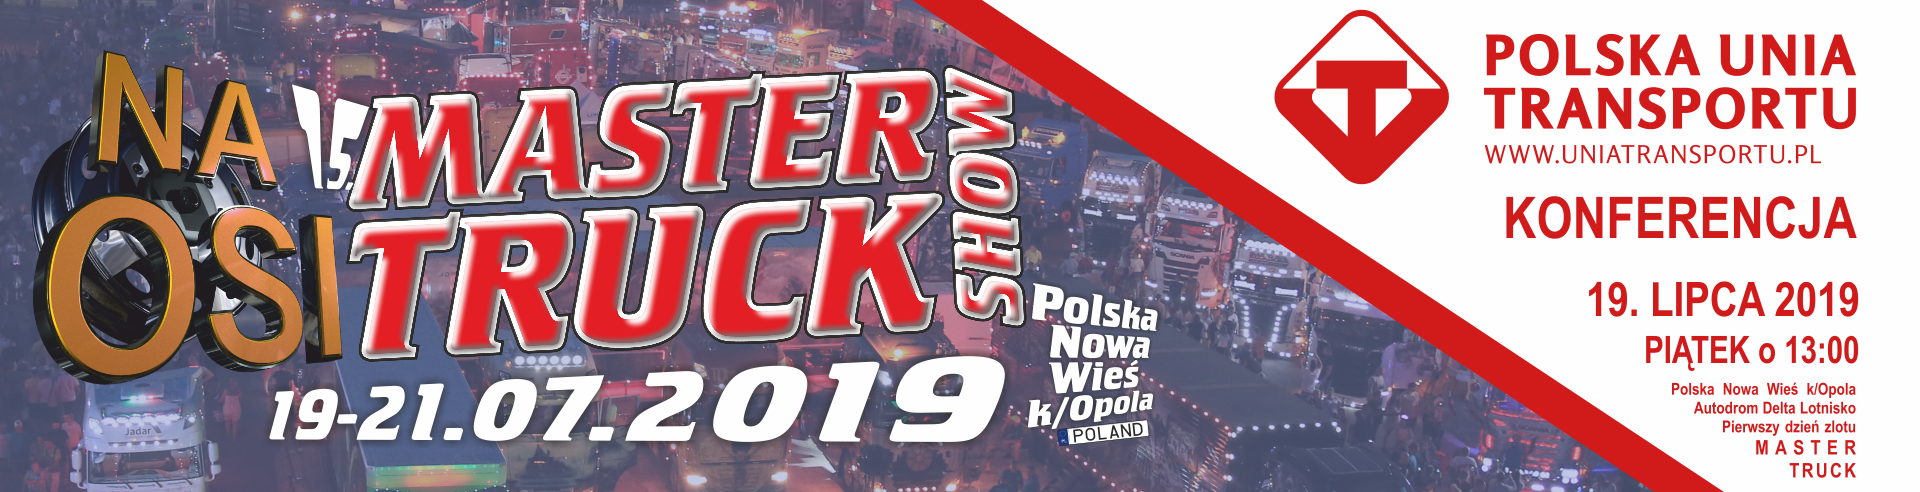 Konferencja Master Truck